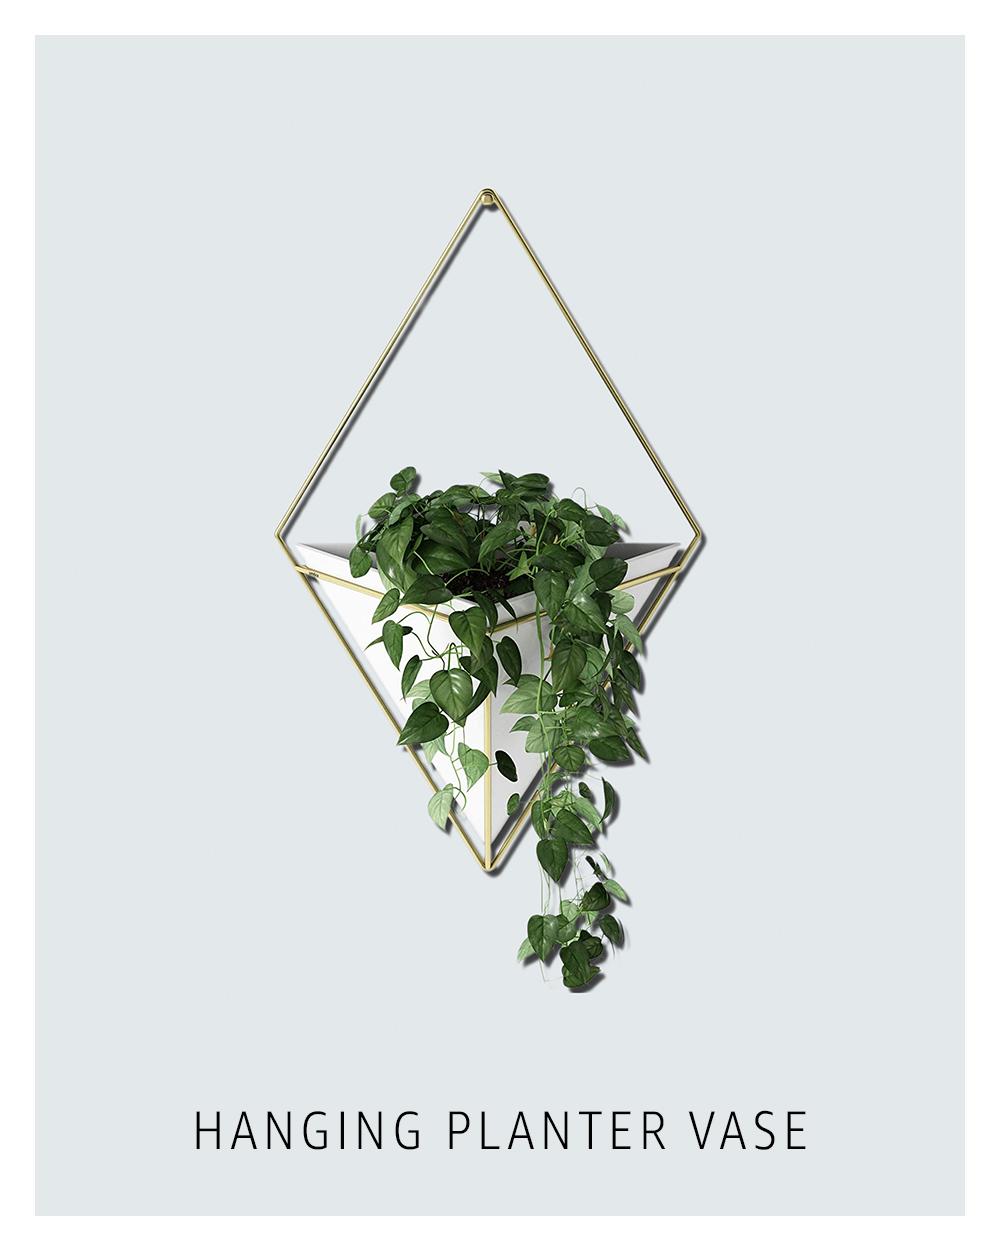 Handing planter vase